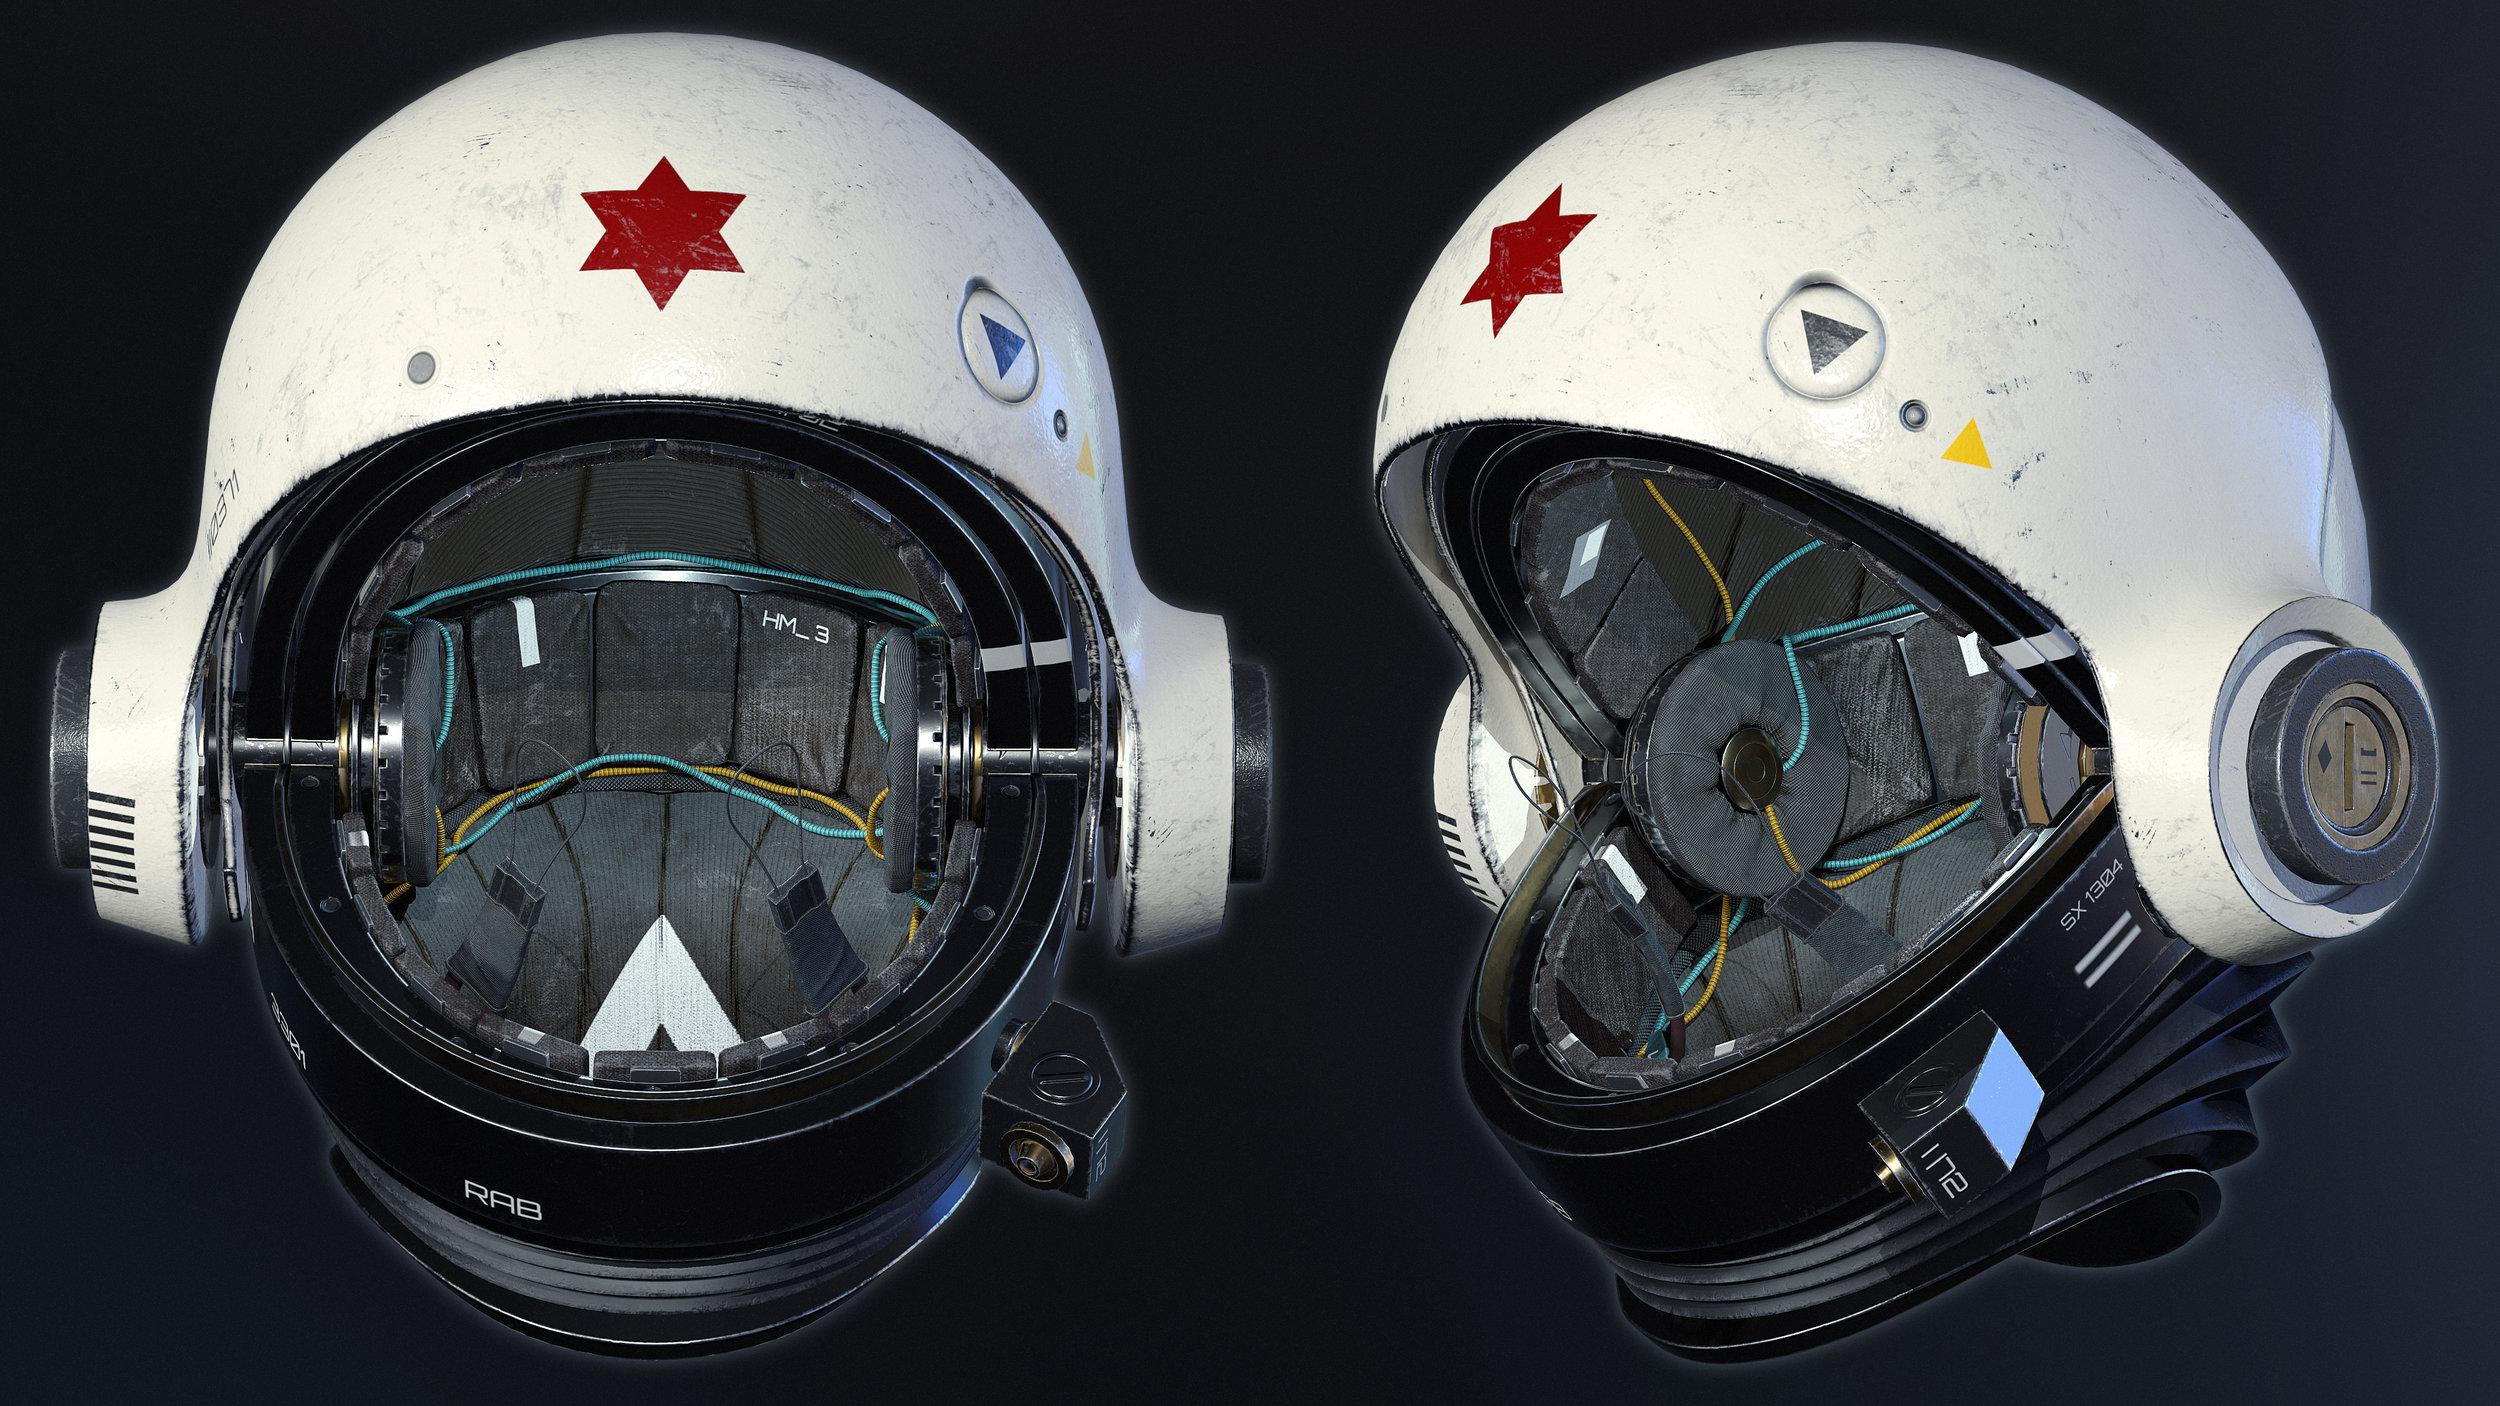 Ryan_Blake_Cosmonaut_Helmet_01_visor.jpg